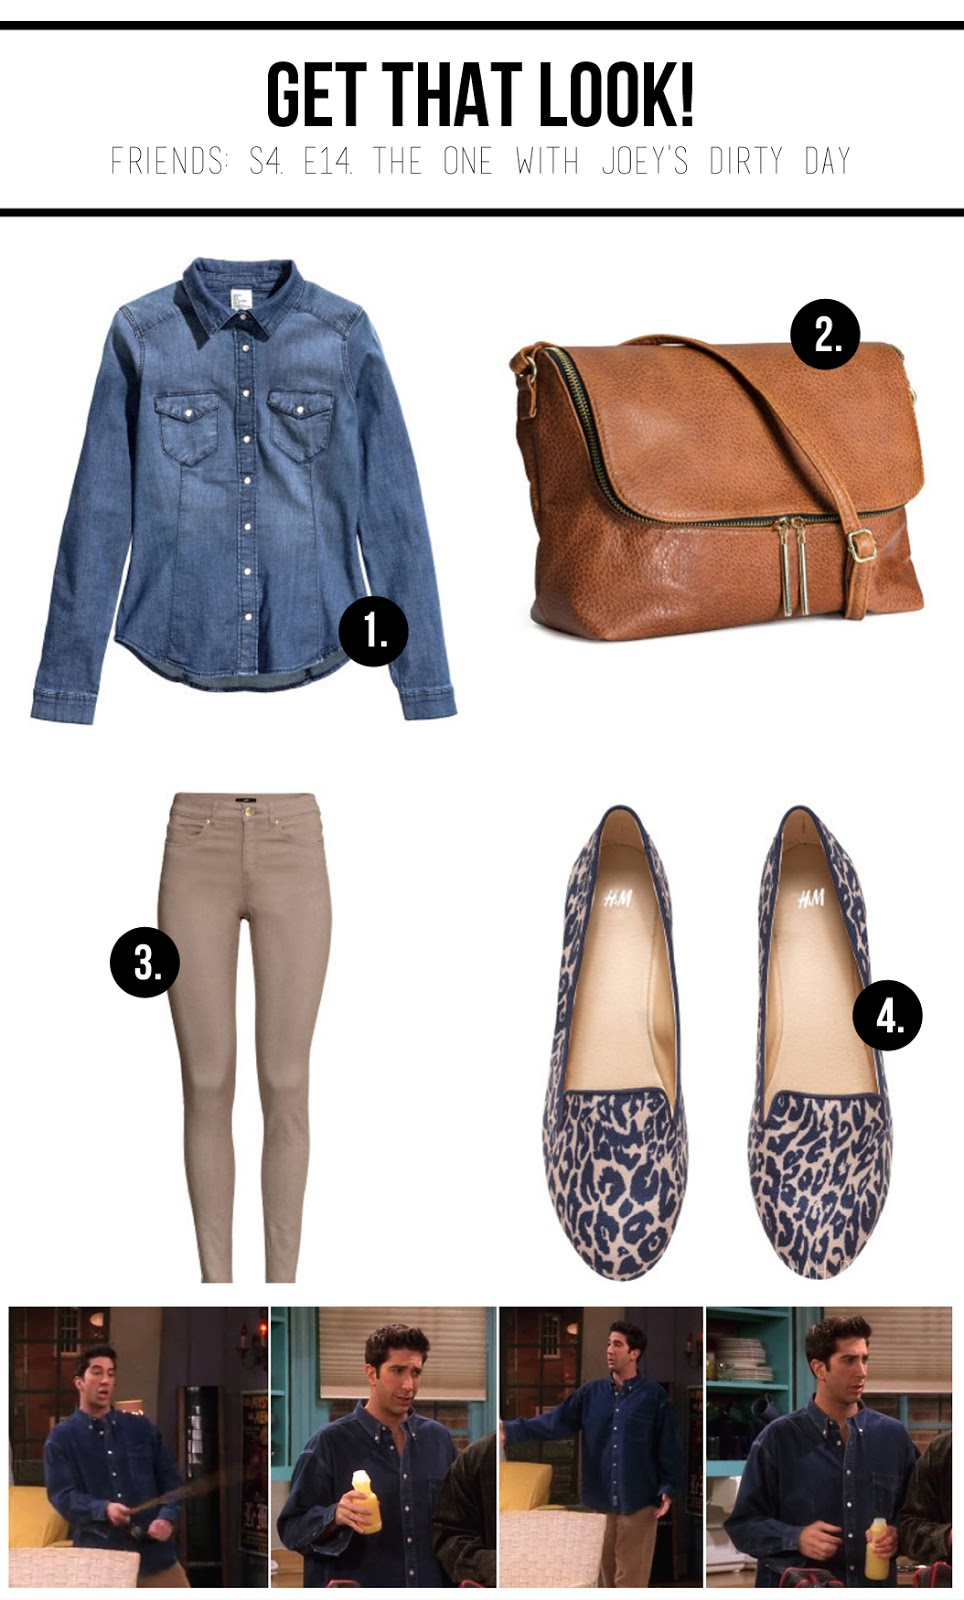 friends-ross-geller-fashion-clothes.jpg